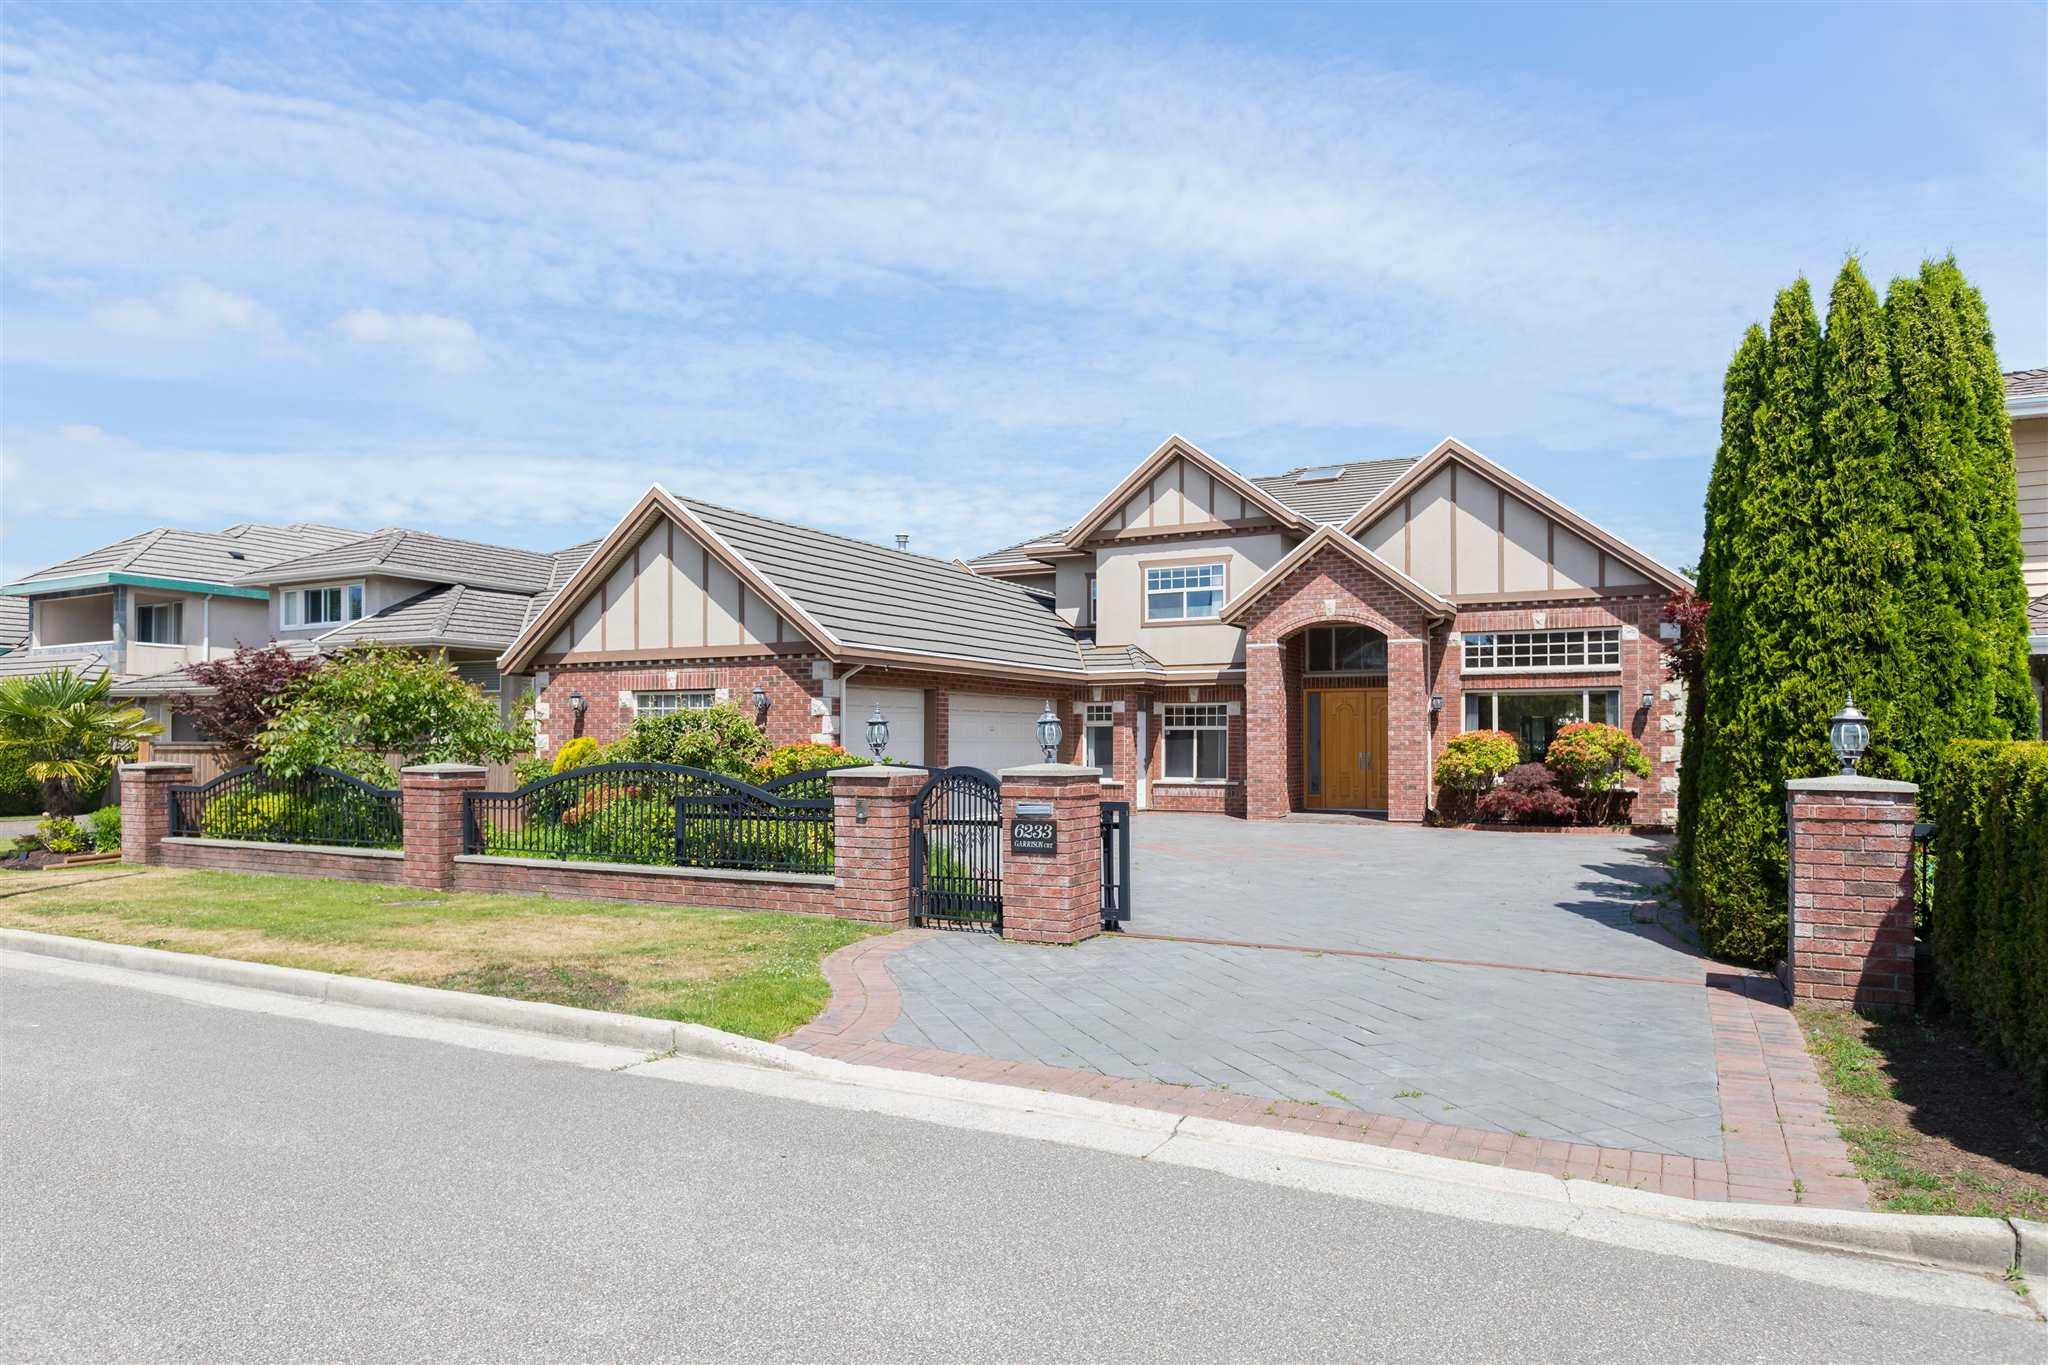 6233 GARRISON COURT - Riverdale RI House/Single Family for sale, 5 Bedrooms (R2597544)